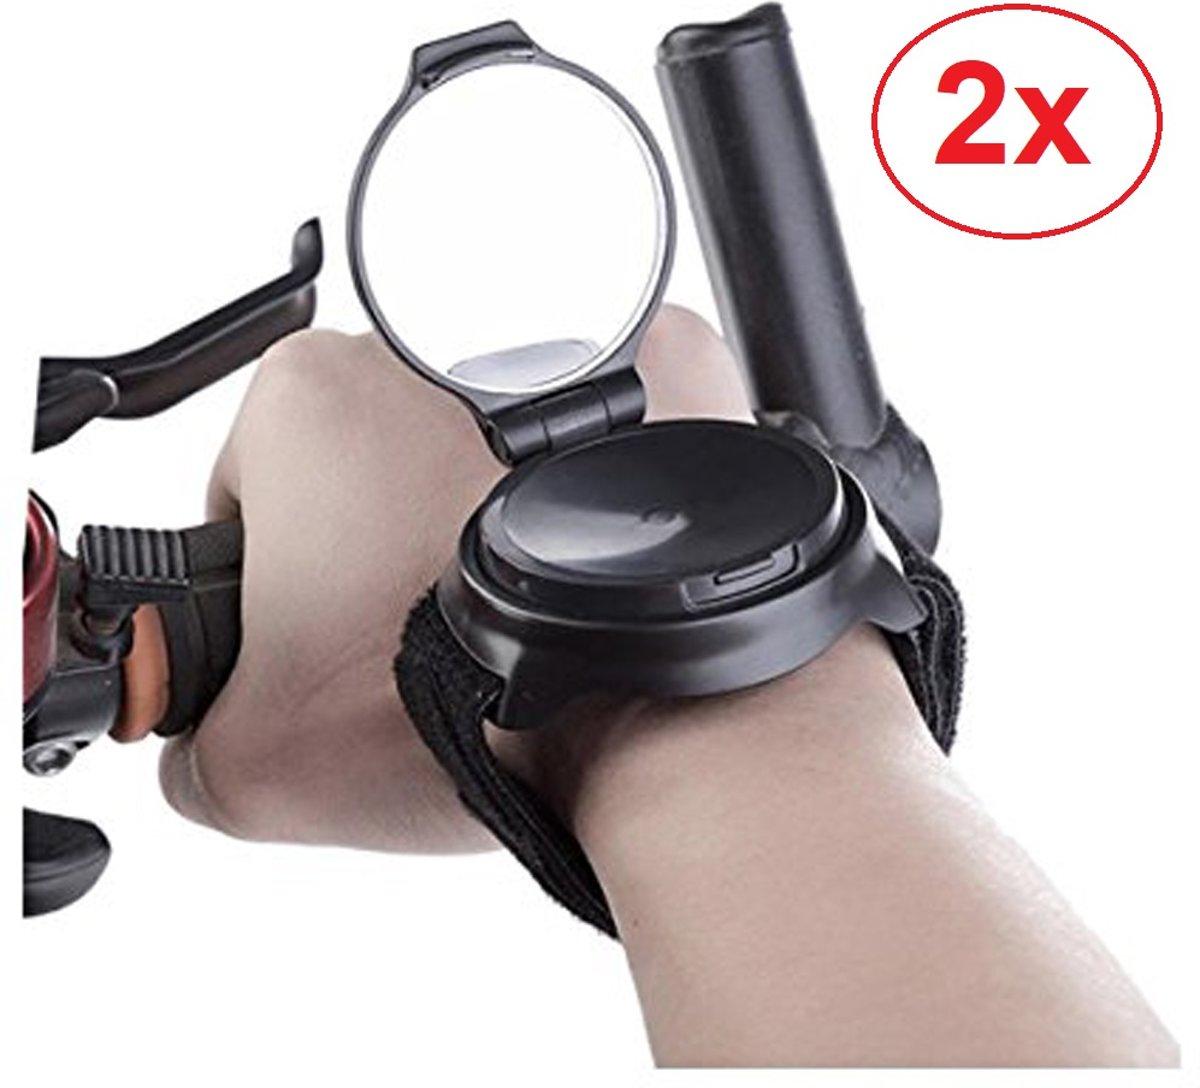 2 x Fietsspiegel armband 360º roterend- achteruitkijkspiegel fiets - mountainbike accessoires - fietsspiegelpolsband – fiets armspiegel